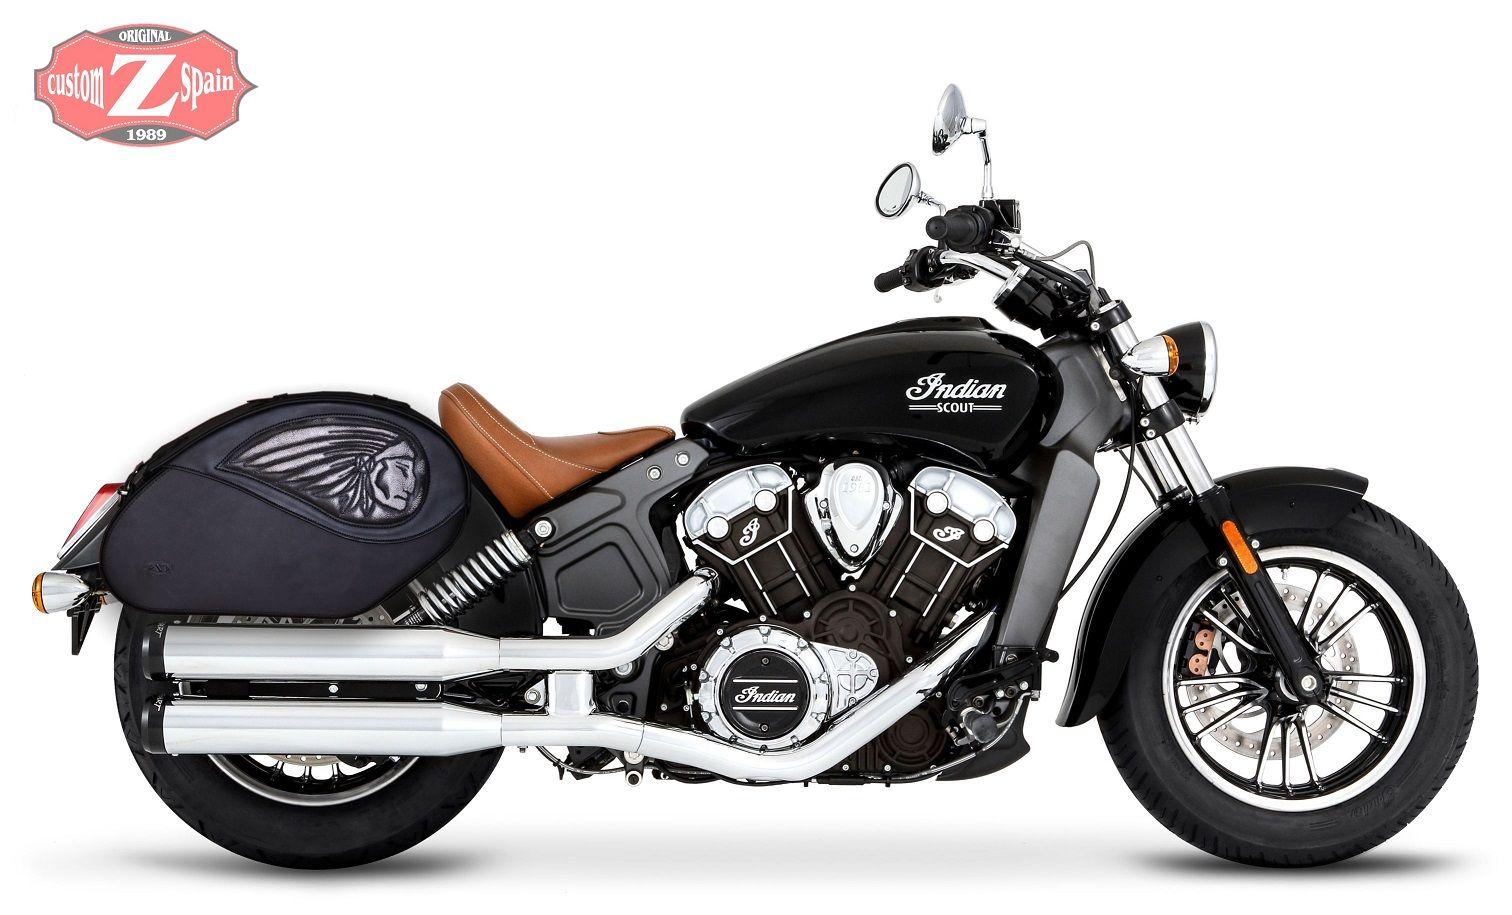 Alforjas Para Indian Scout Rigidas Modelo Vendetta Indian Saddlebag Www Customspain Com Explorador Indio Motocicletas Indian Motos Clasicas [ 915 x 1512 Pixel ]